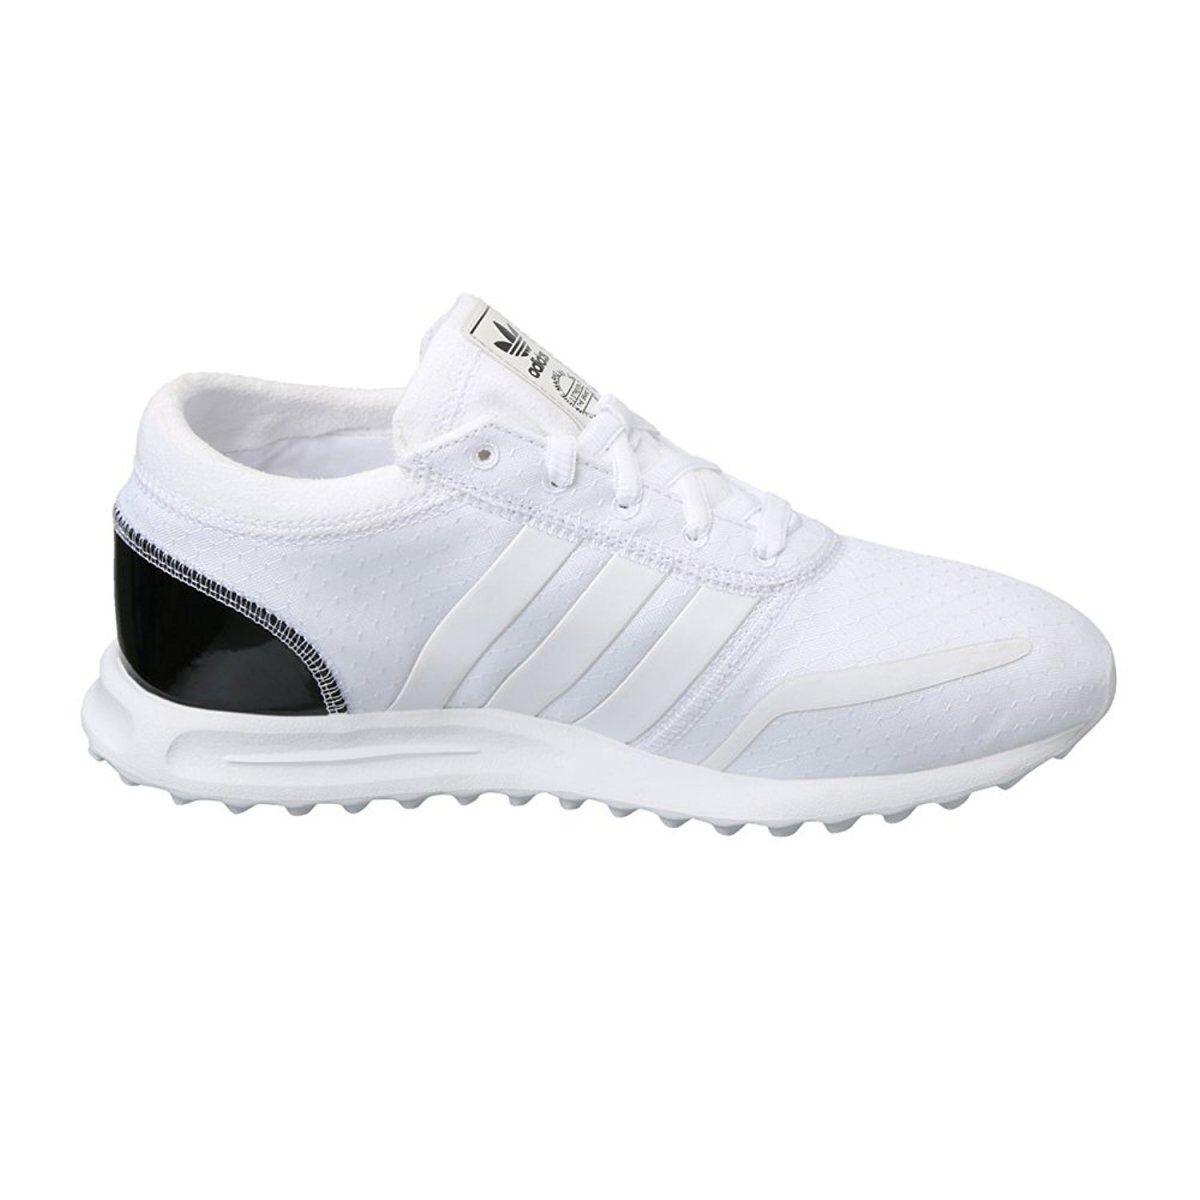 ADIDAS ORIGINALS LOS ANGELES Herren Turnschuhe Sneaker Sportschuhe S79765